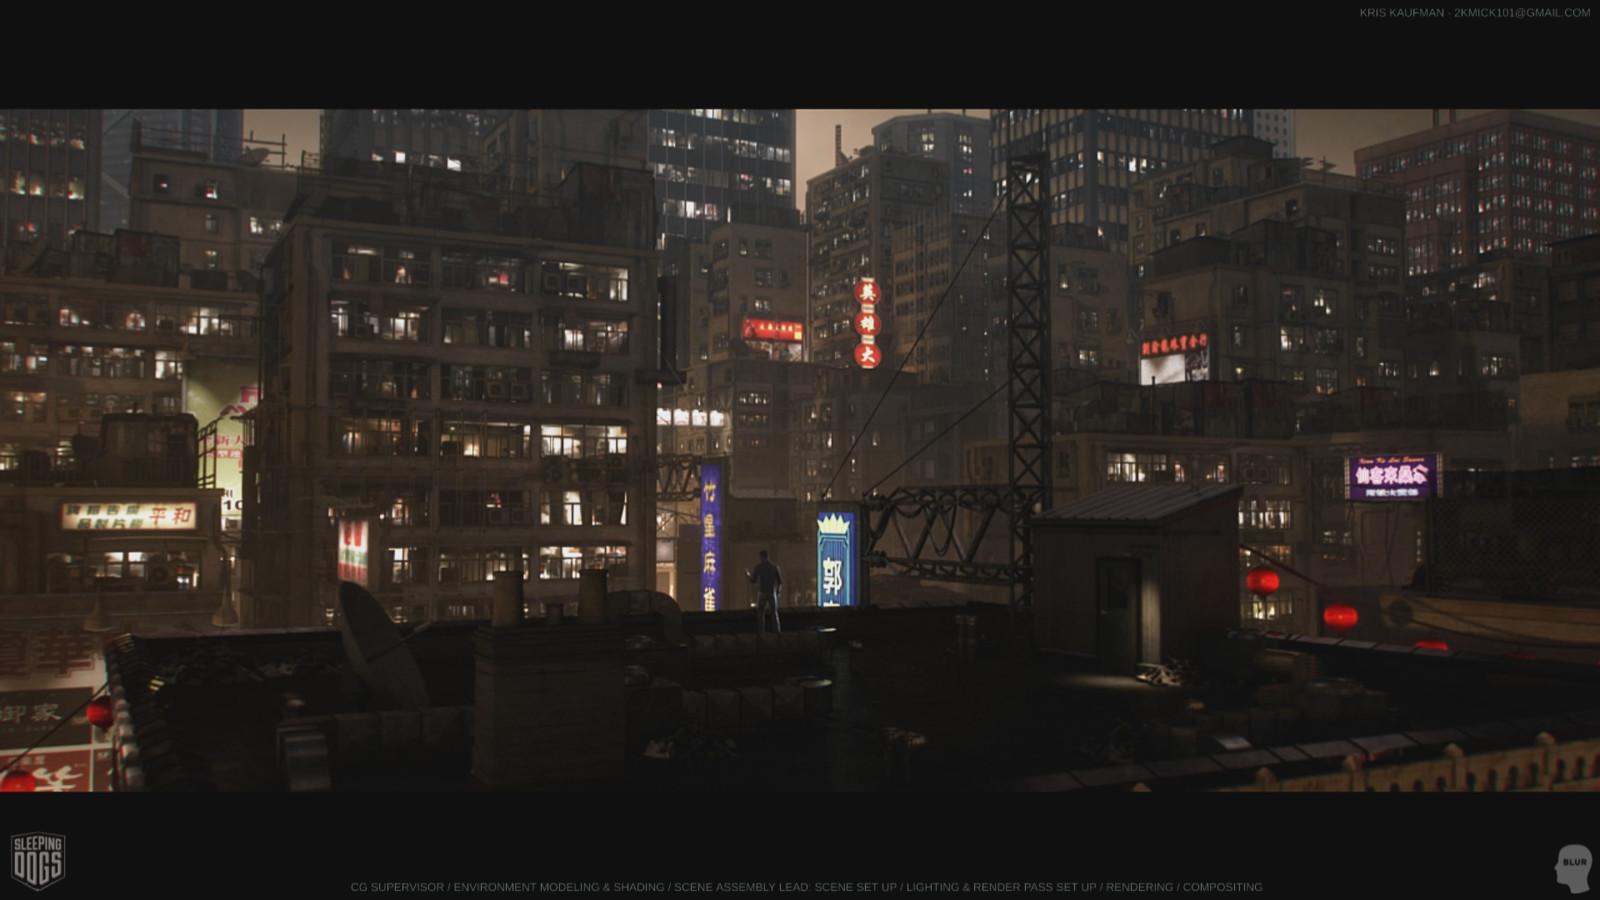 Sleeping Dogs: CG Sup / Look Development / Environment Modeling & Shading / Lighting / Rendering / Compositing